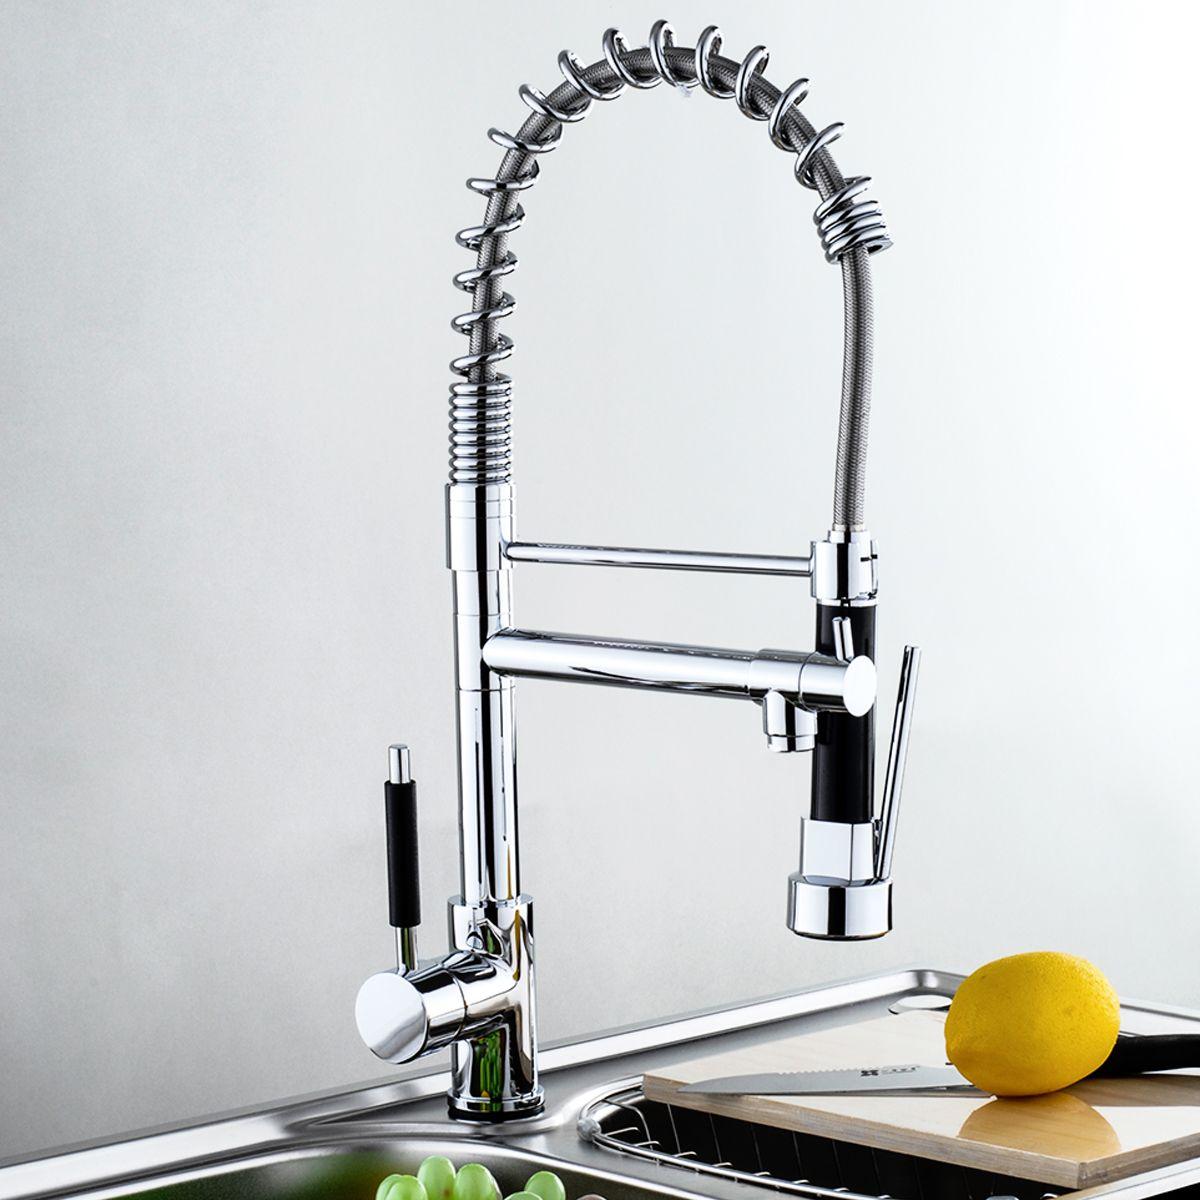 Modern Kitchen Sink Faucets Swivel Spout Chrome Brass Kitchen Faucet Dual Sprayer Vessel Sink